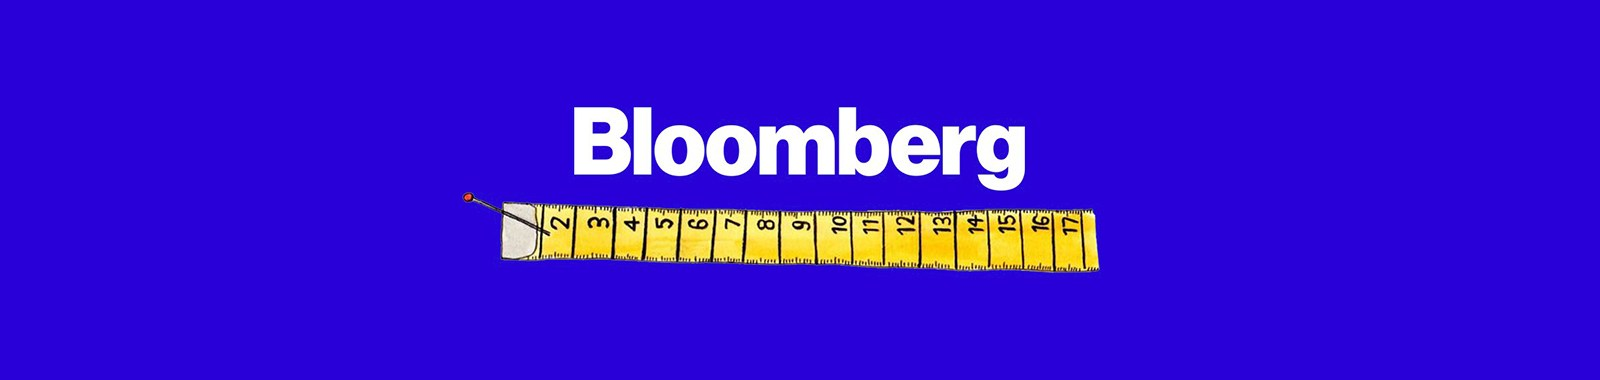 bloomberg-eye